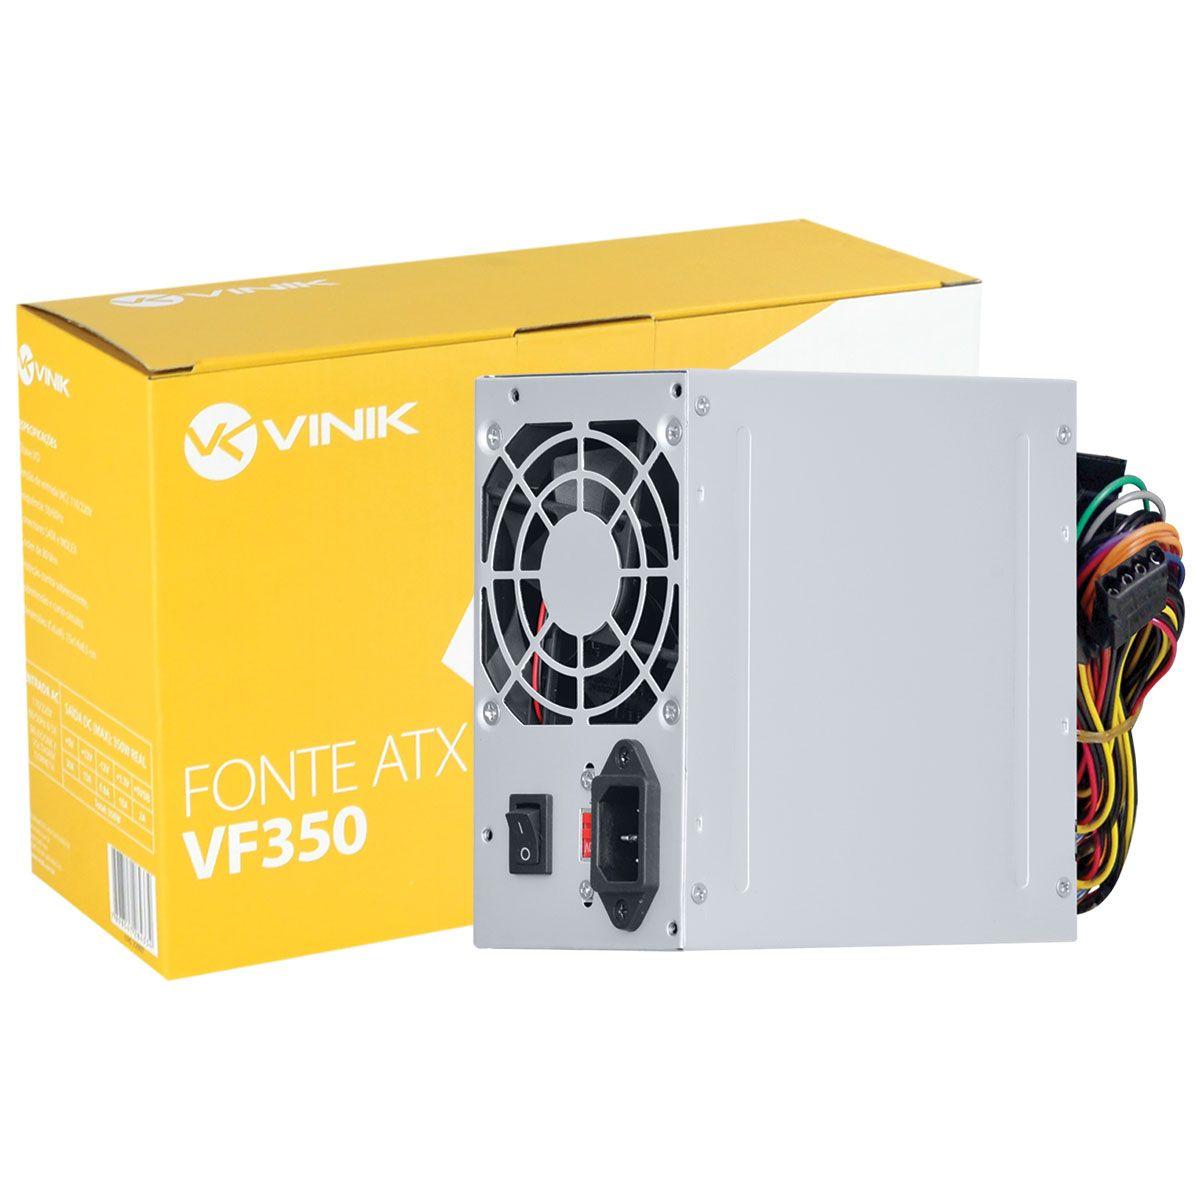 Fonte Atx 350W Real Bivolt 24 Pinos VF350 VINIK